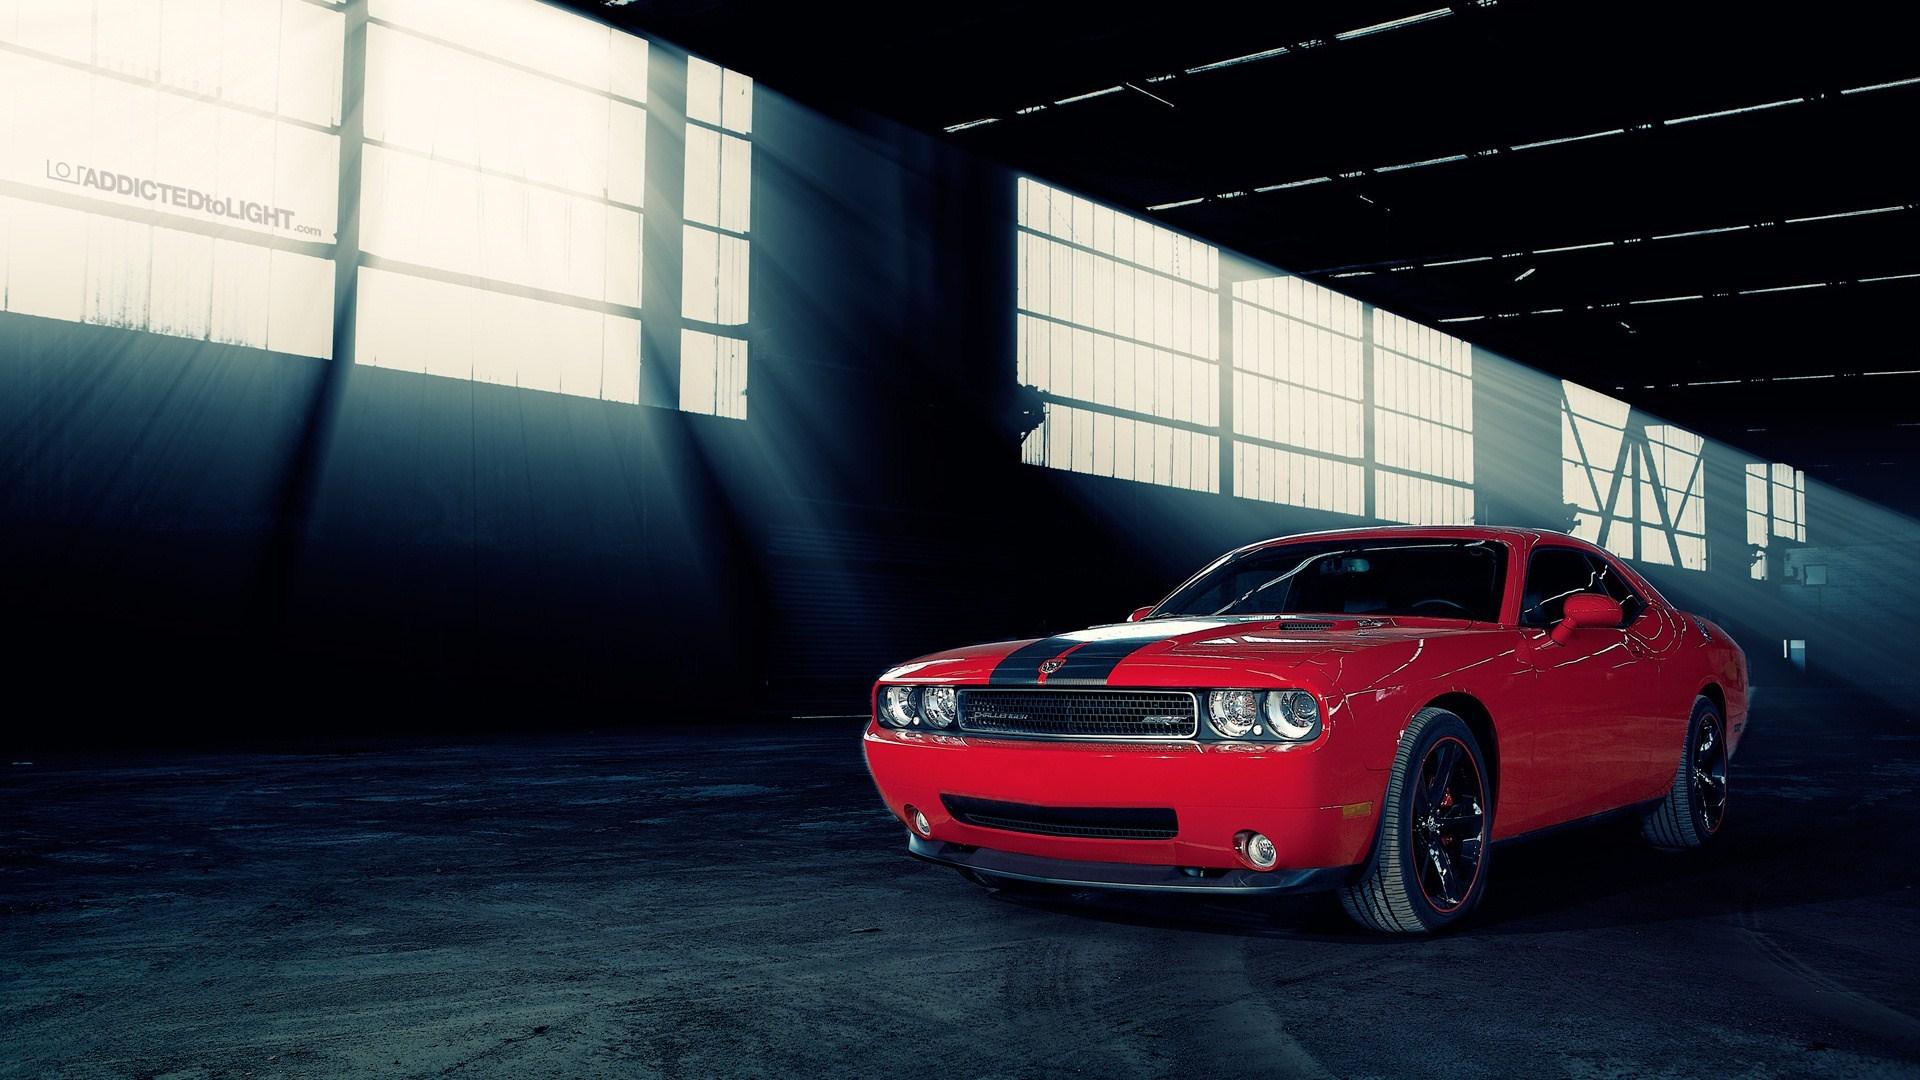 Red Dodge Challenger SRT Warehouse